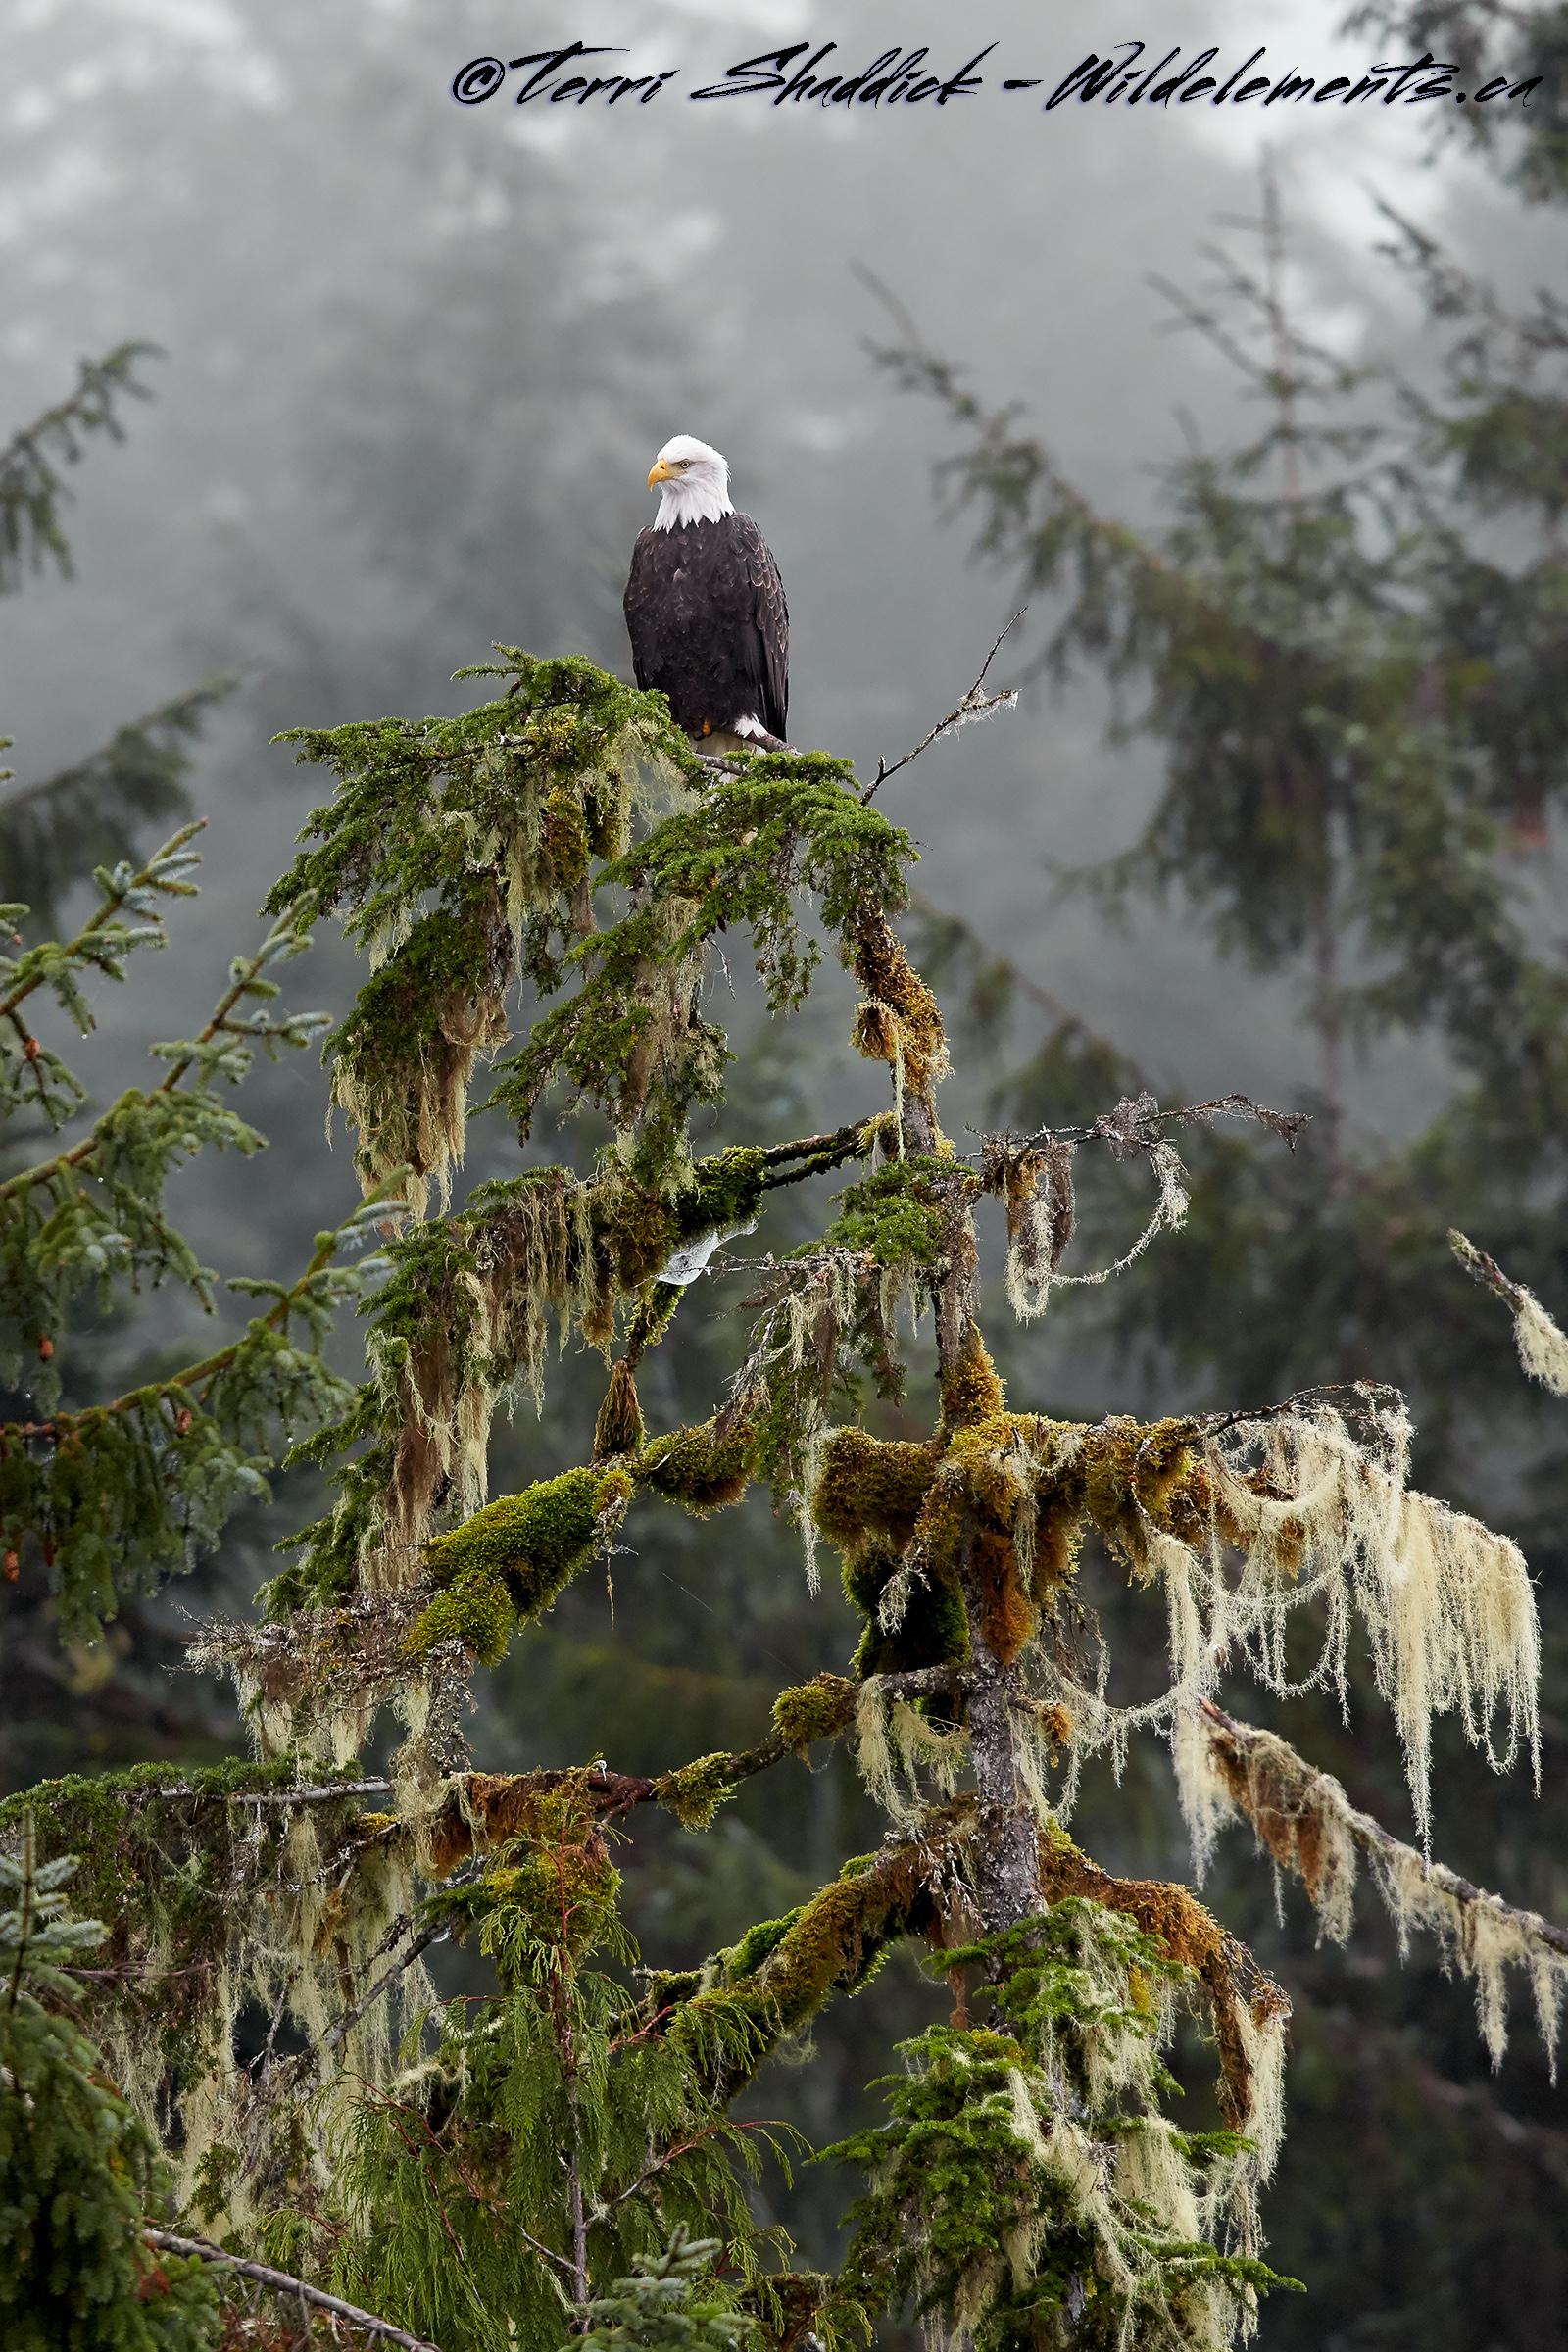 Bald Eagle perched on tree